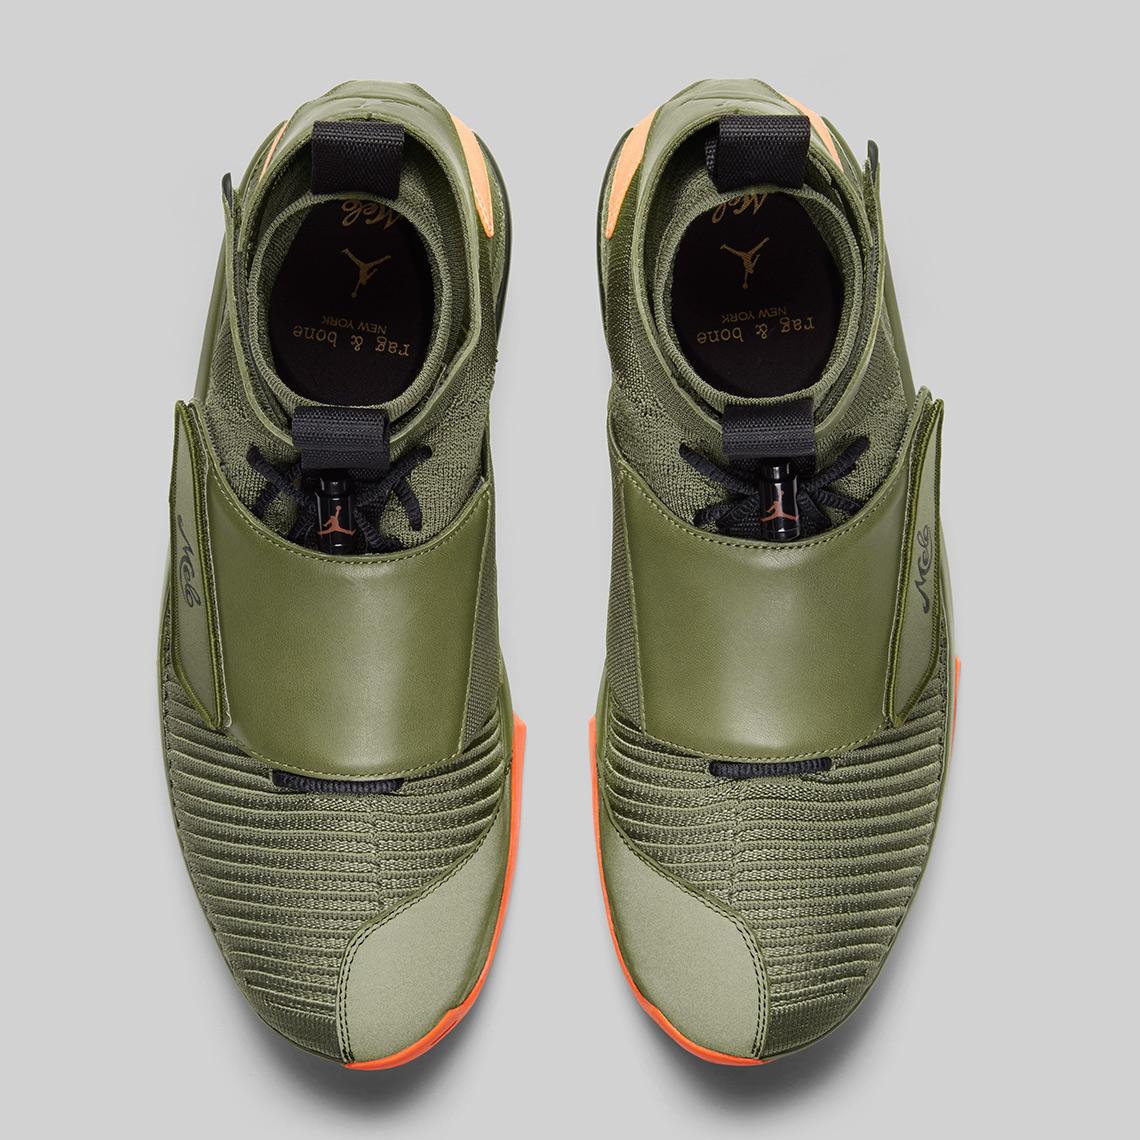 f10f09aea94 Carmelo Anthony Rag And Bone Air Jordan 20 Flyknit Release Info ...